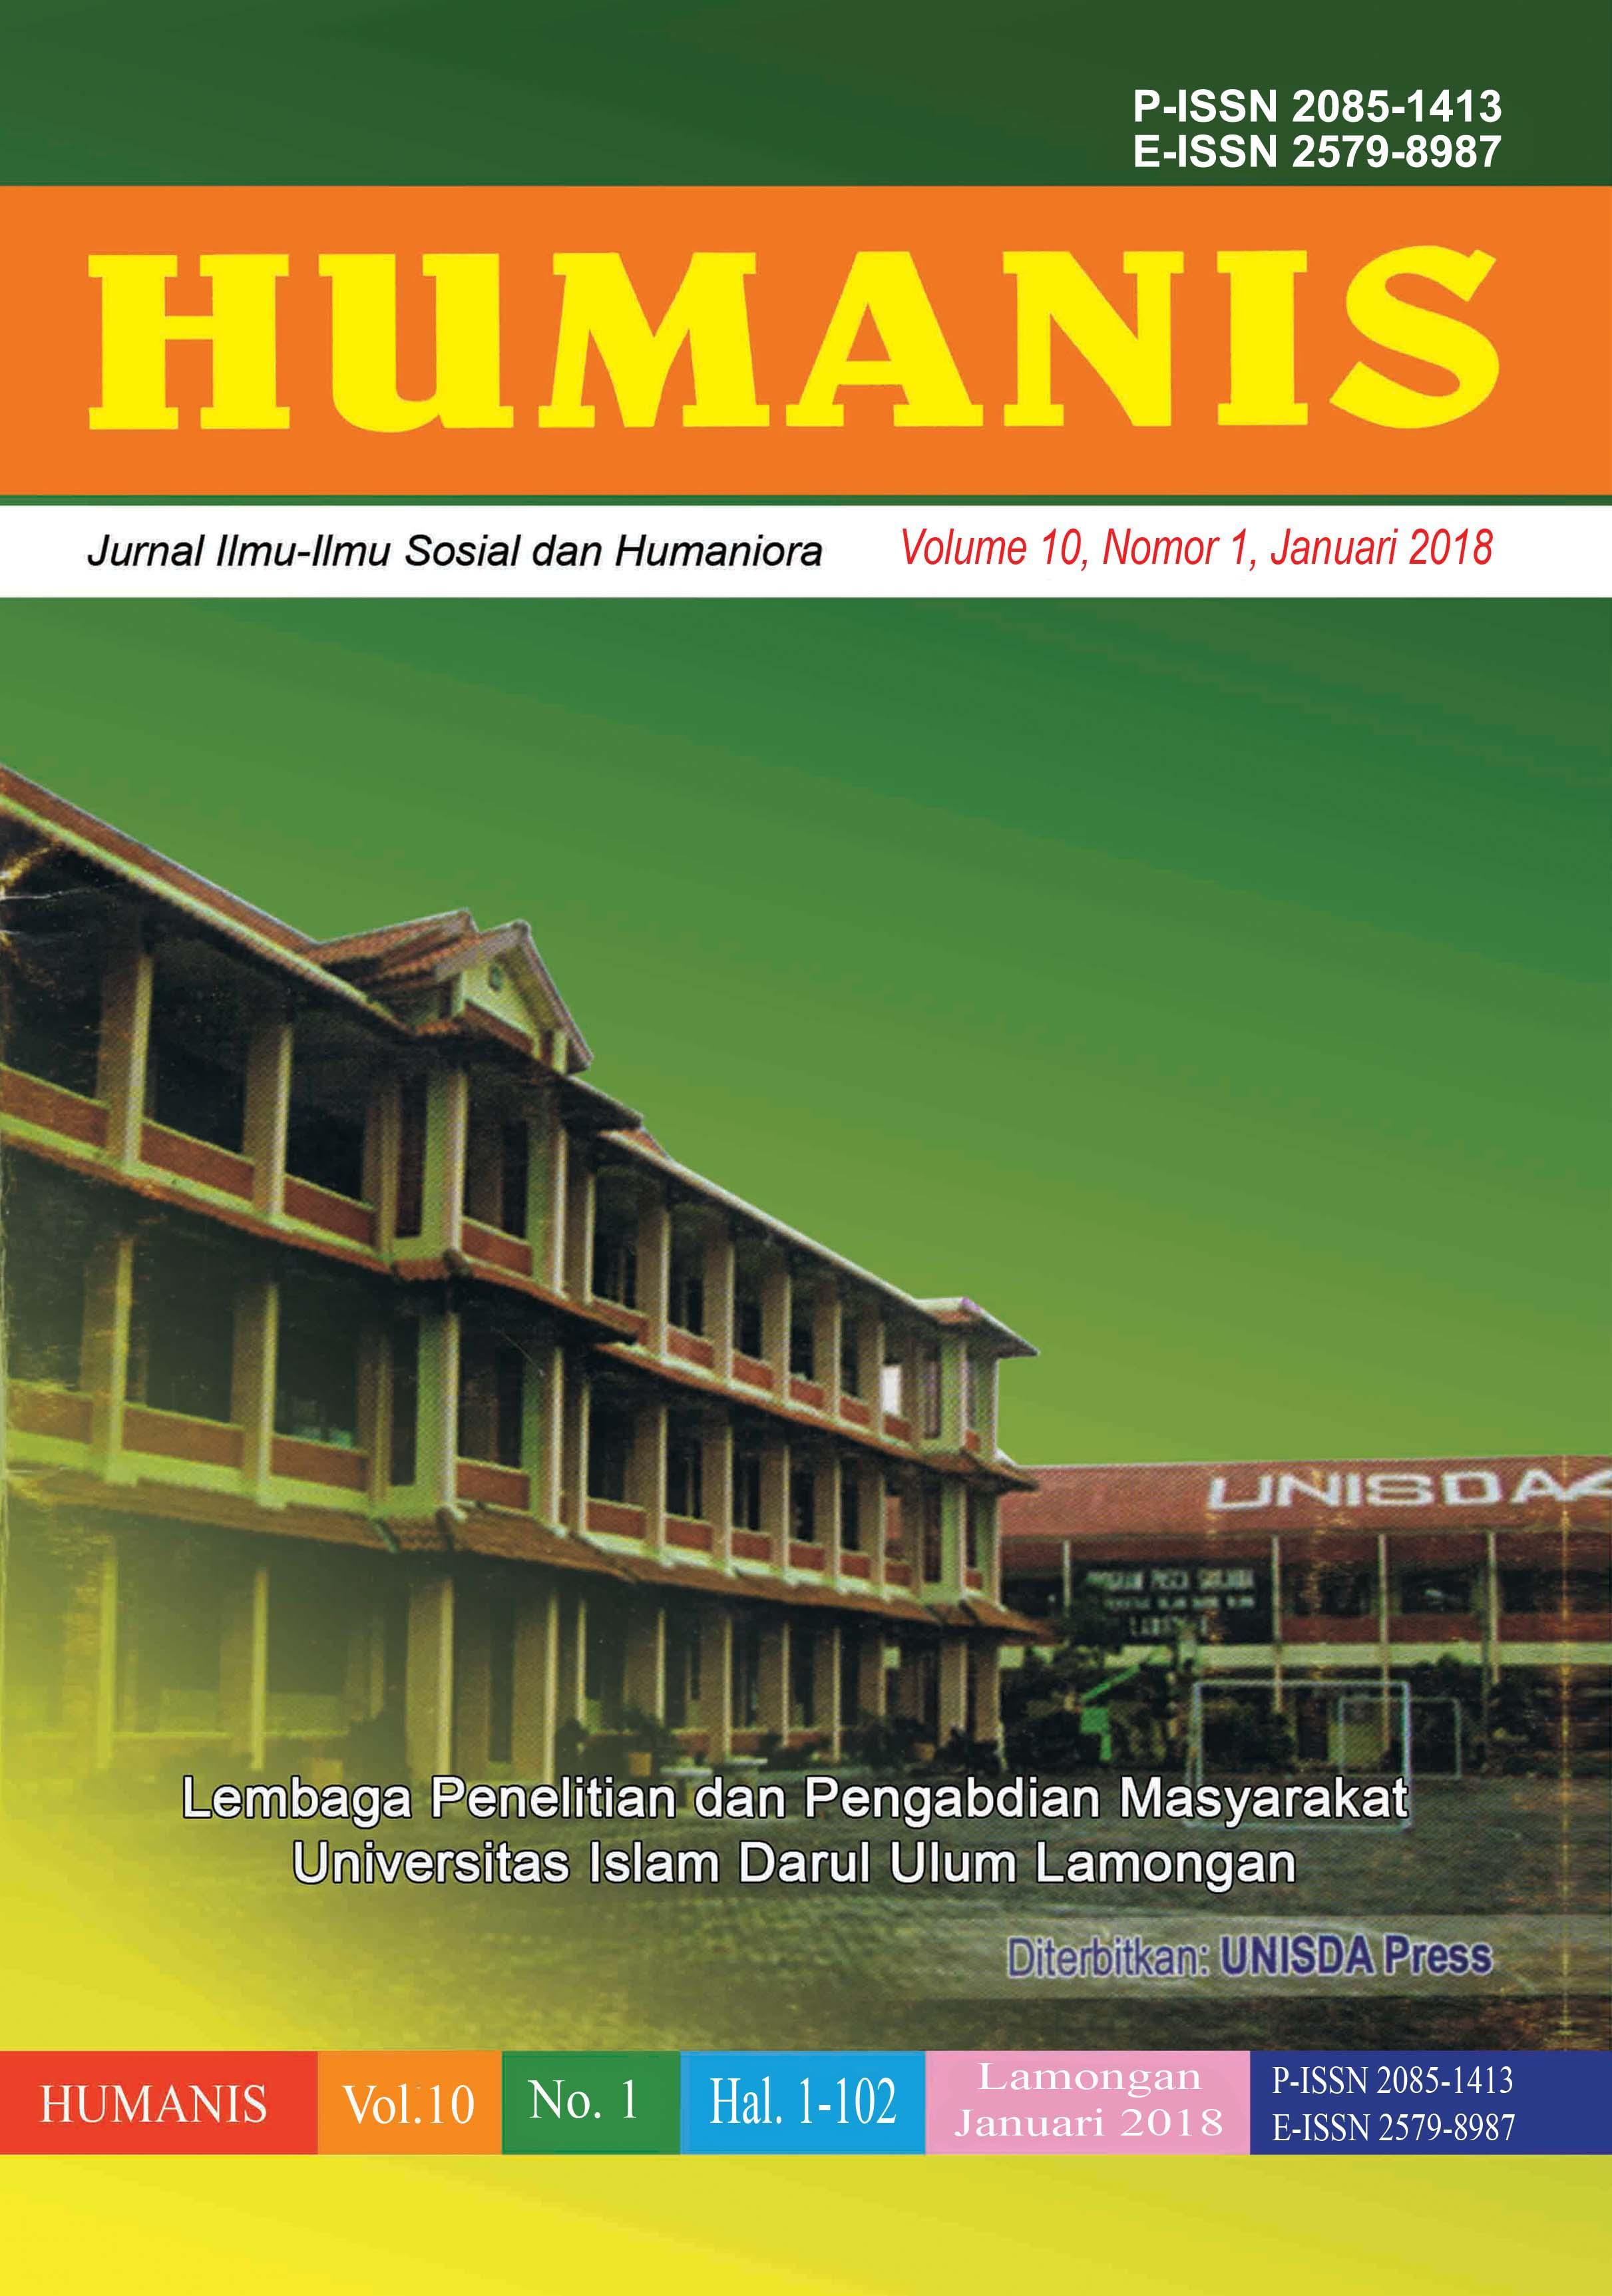 Humanis: Jurnal Ilmu-Ilmu Sosial dan Humaniora